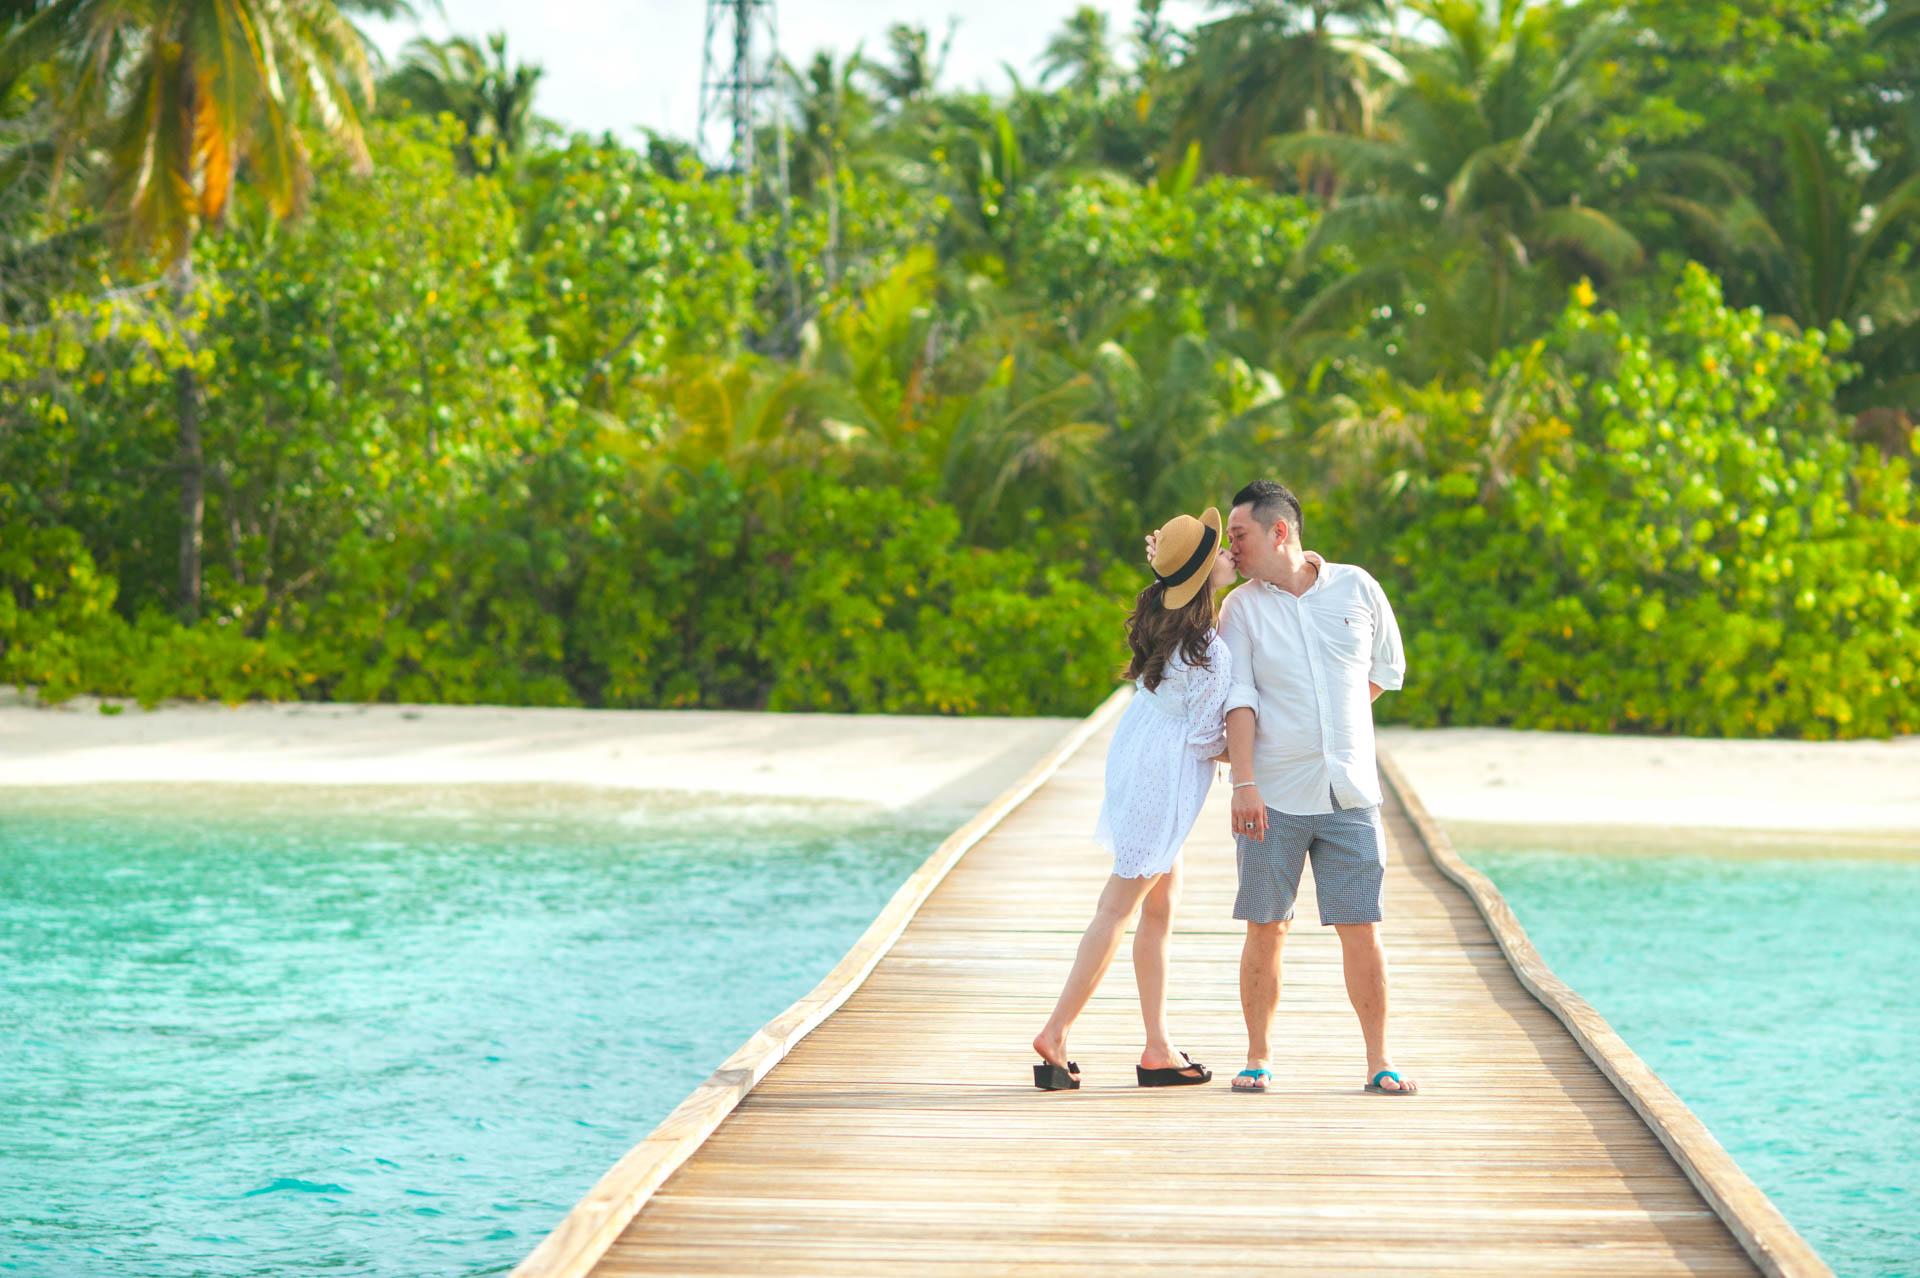 Chin Siew and Chin Yee Honeymoon in Maldives at Huvafen Fushi Resort Under Water Spa 4